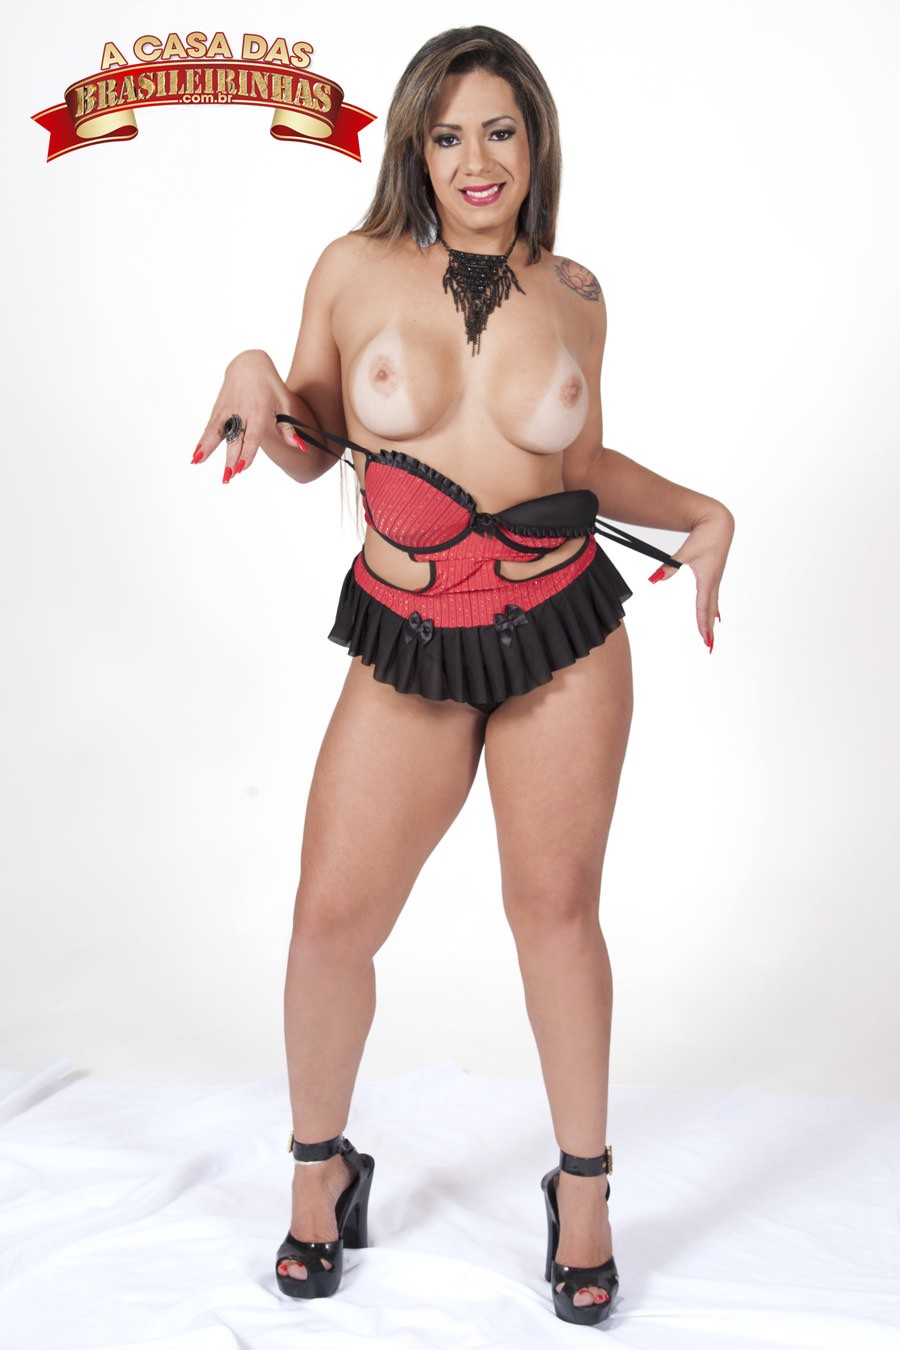 suzie-slut-tirando-lingerie.jpg